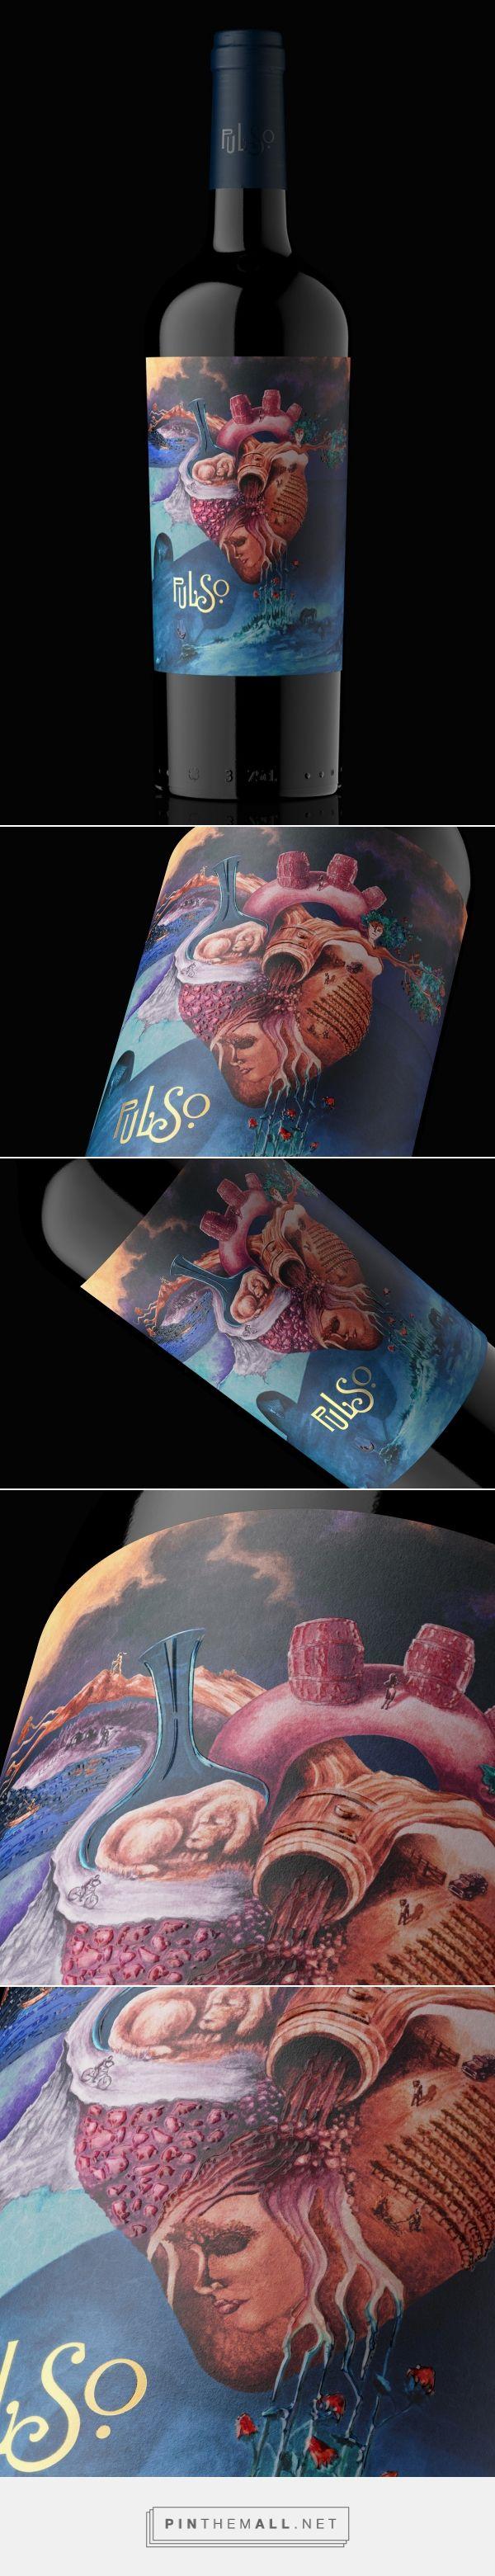 PULSO wine label design by ZARATE · INSA | design studio - http://www.packagingoftheworld.com/2017/08/pulso.html